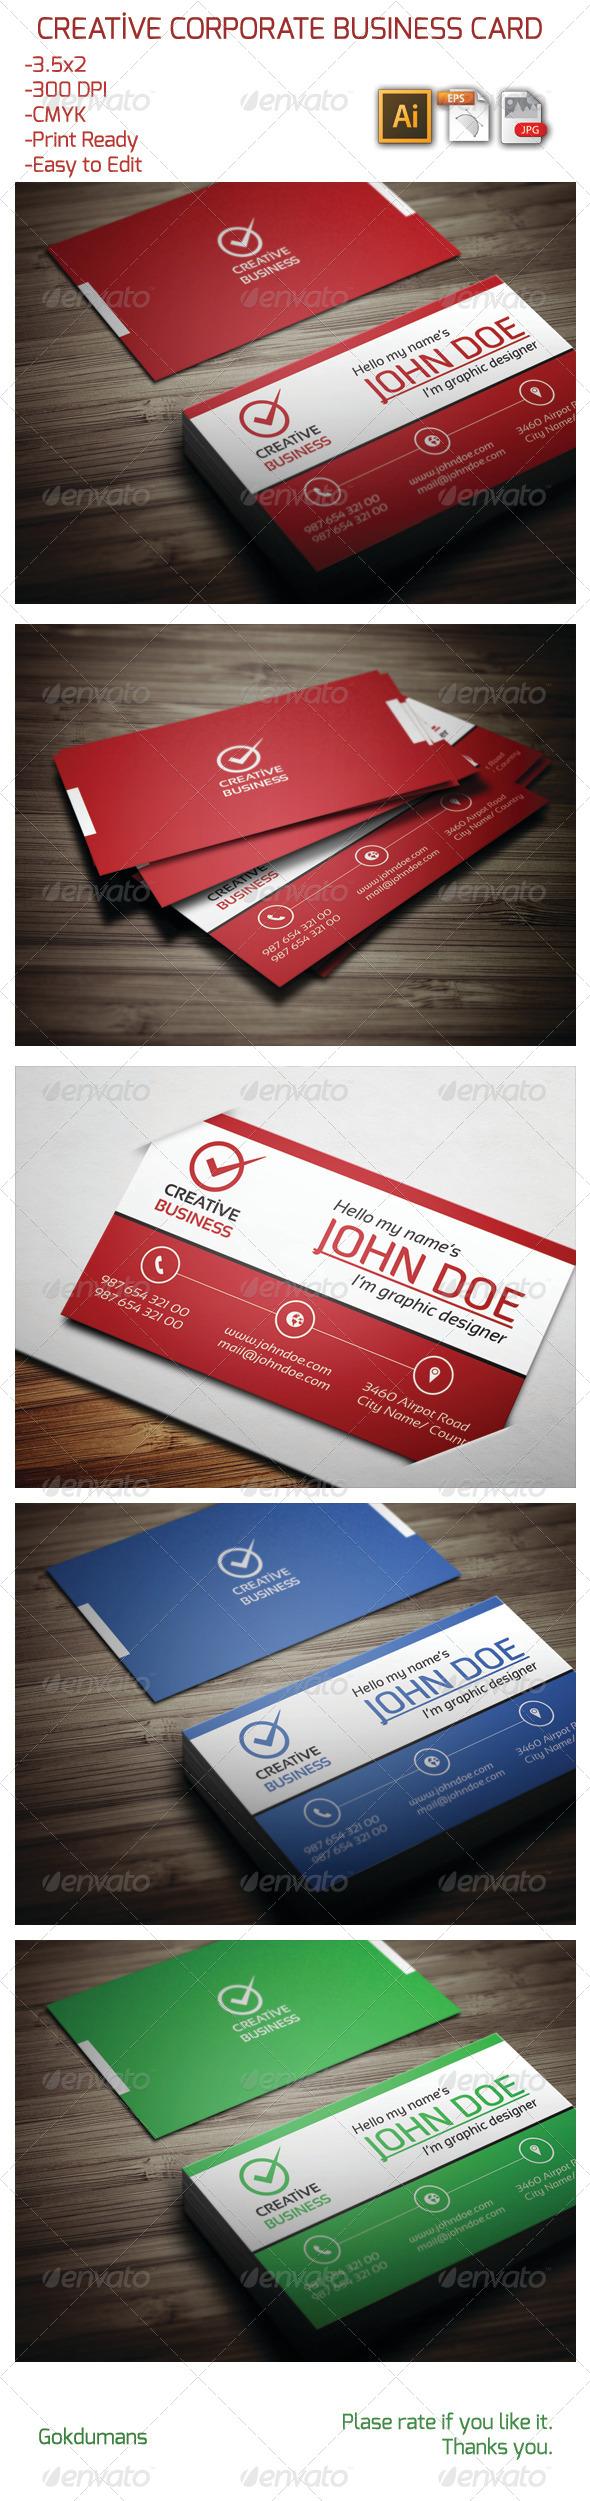 Creative Corporate Business Card 13 - Creative Business Cards